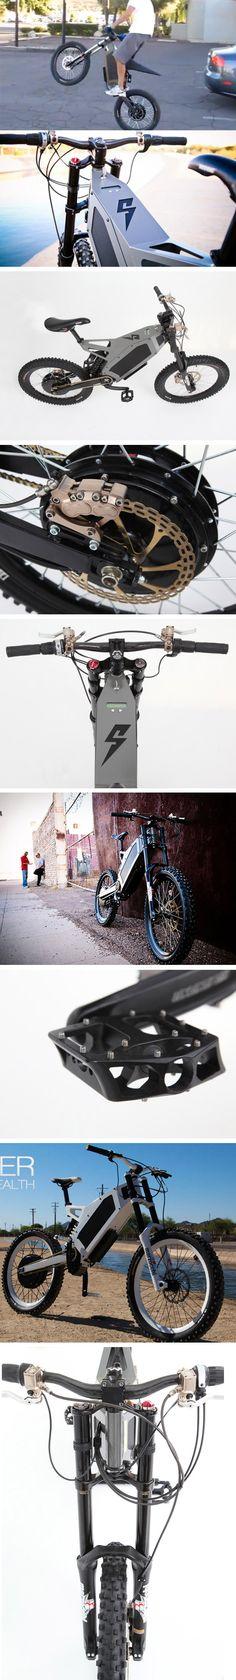 Bike elétrica de alta performance